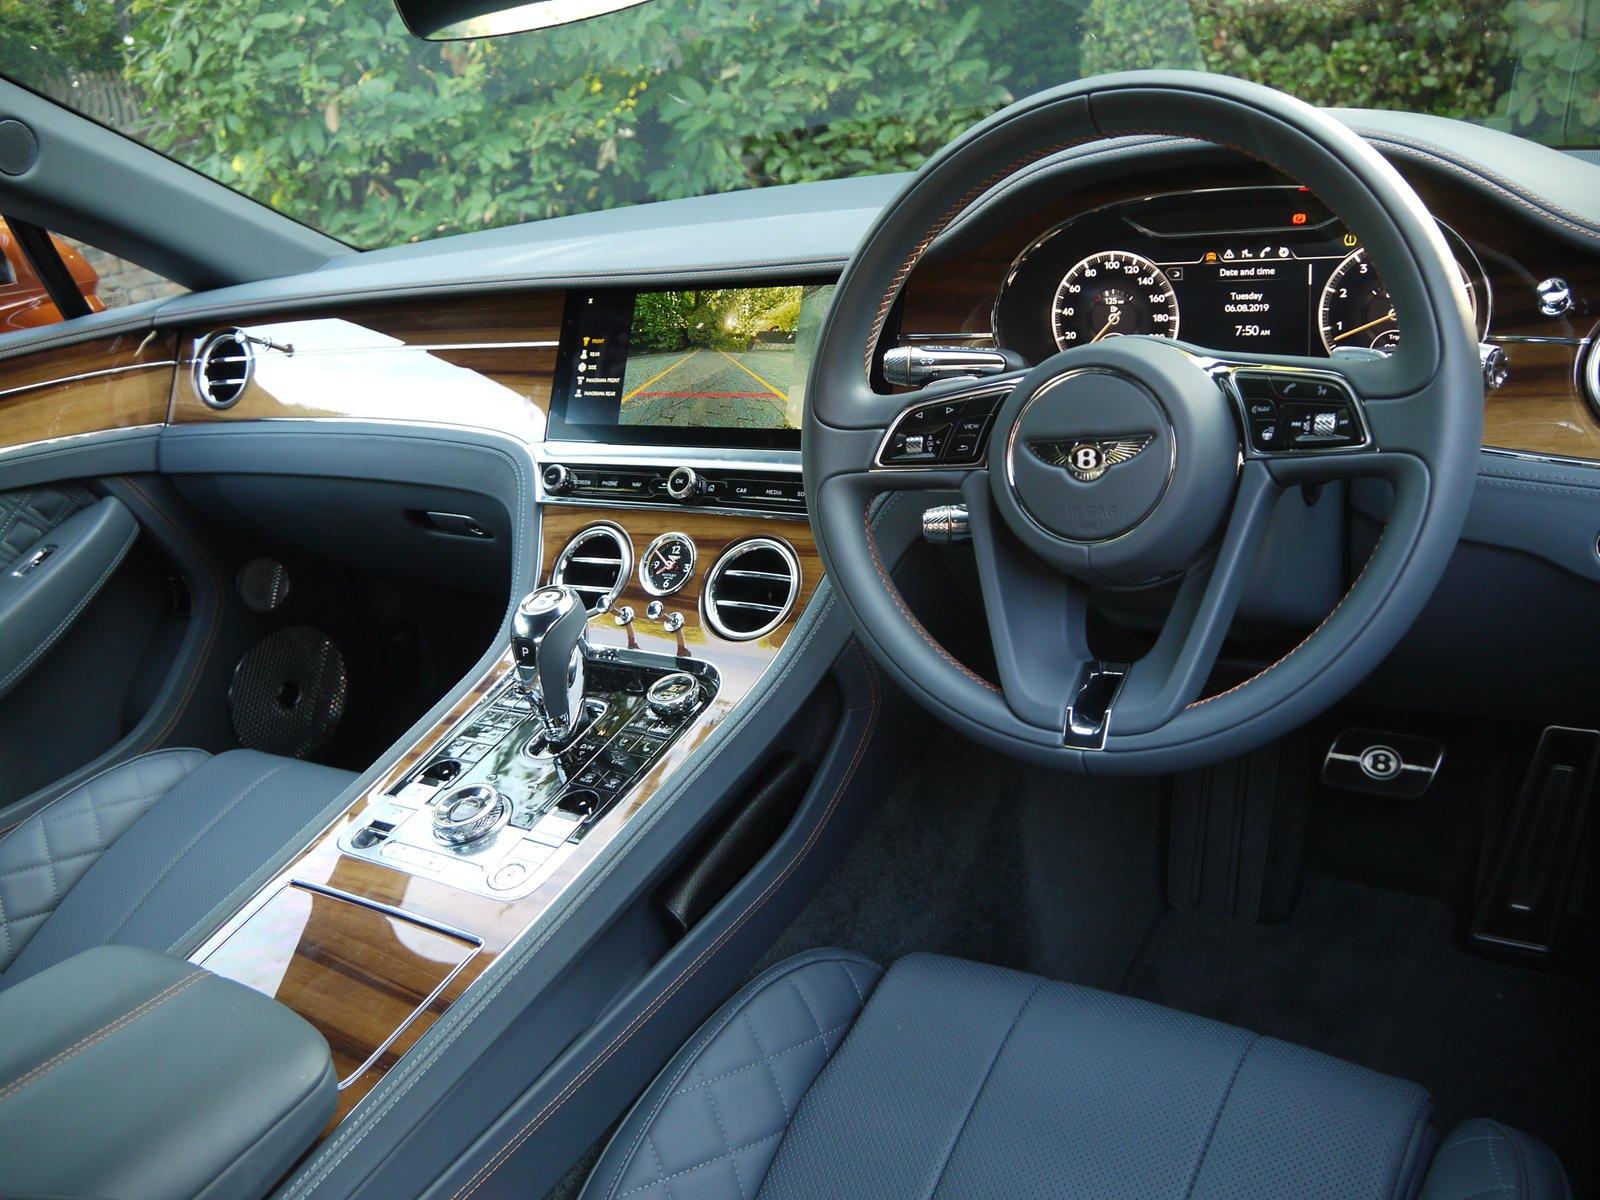 Nội thất Bentley Continental GT 2019.